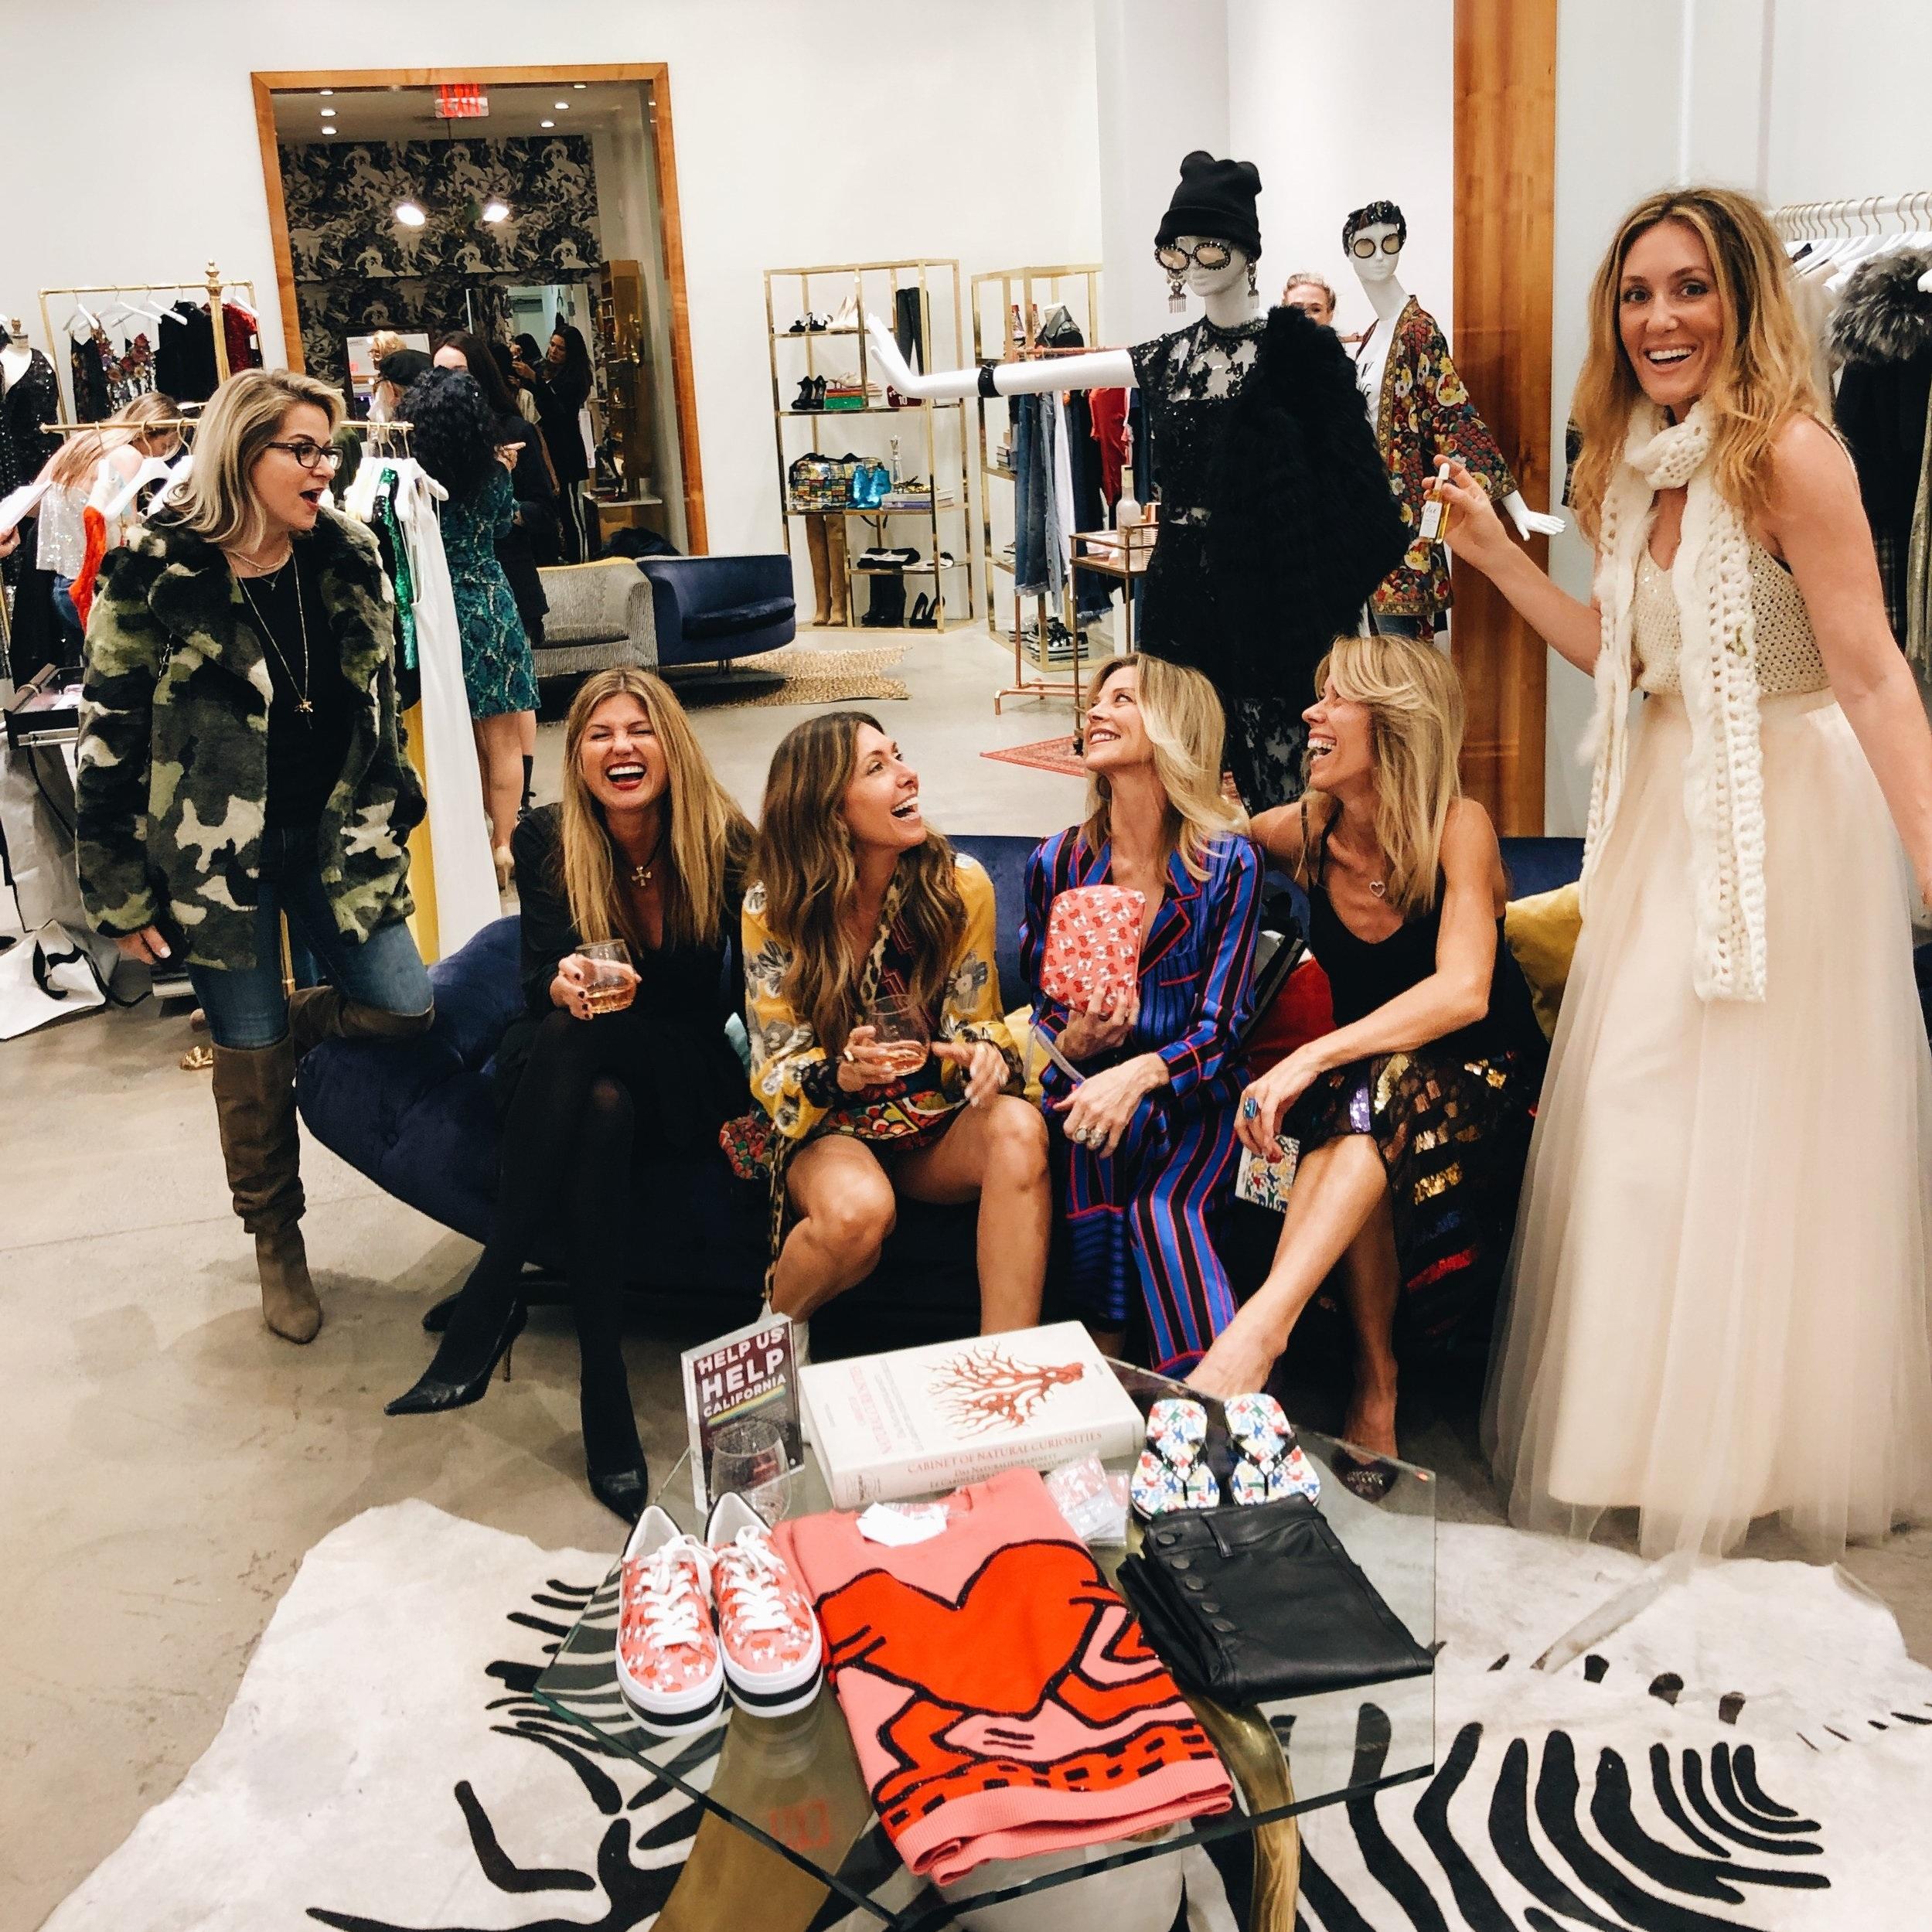 Photo at Alice+ Olivia: Cathy Moretti, Alexandra Musco, mua, Janet Gunn, Kirschen Katz, Naomi Klein